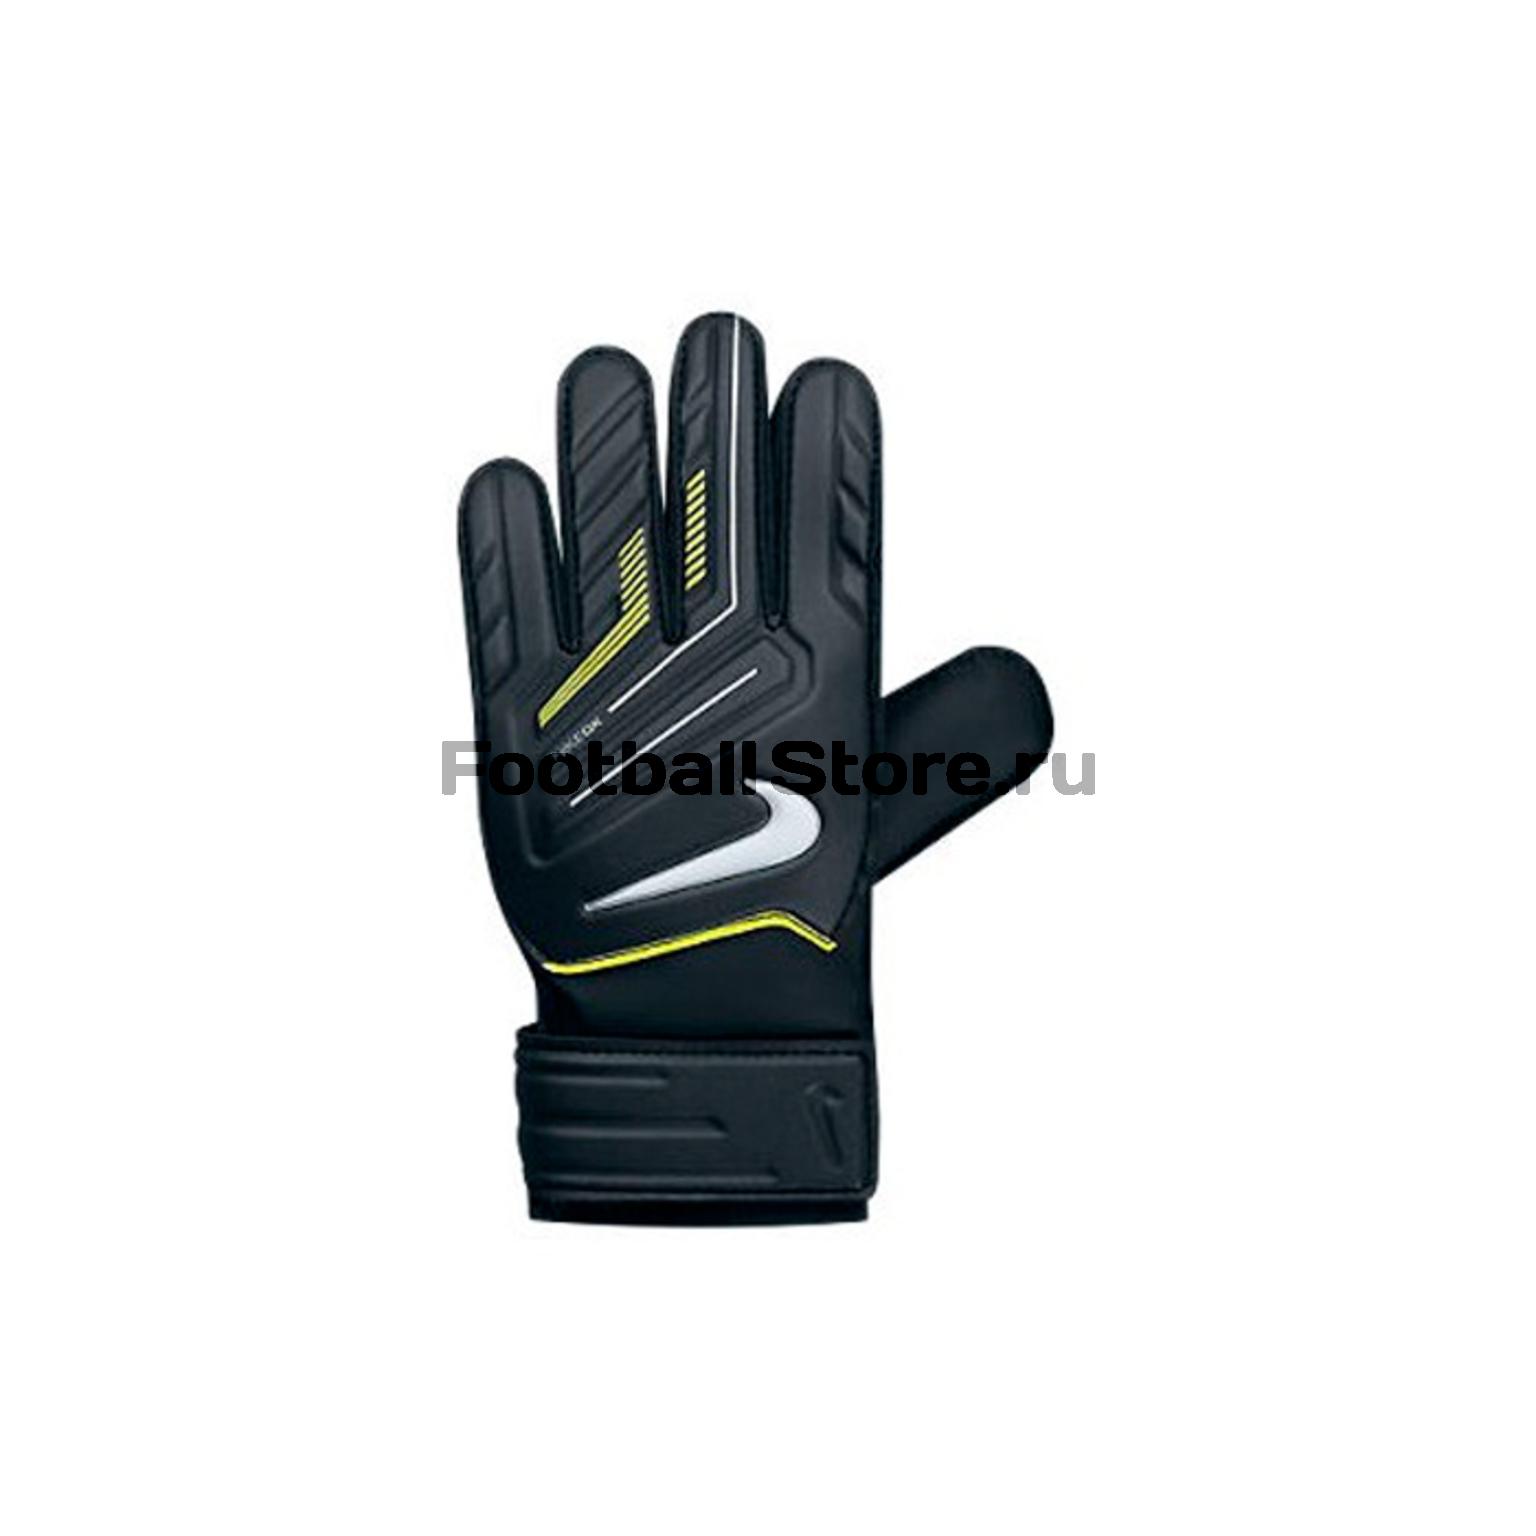 Вратарская экипировка Nike Вратарские перчатки Nike GK JR Match GS0259-072